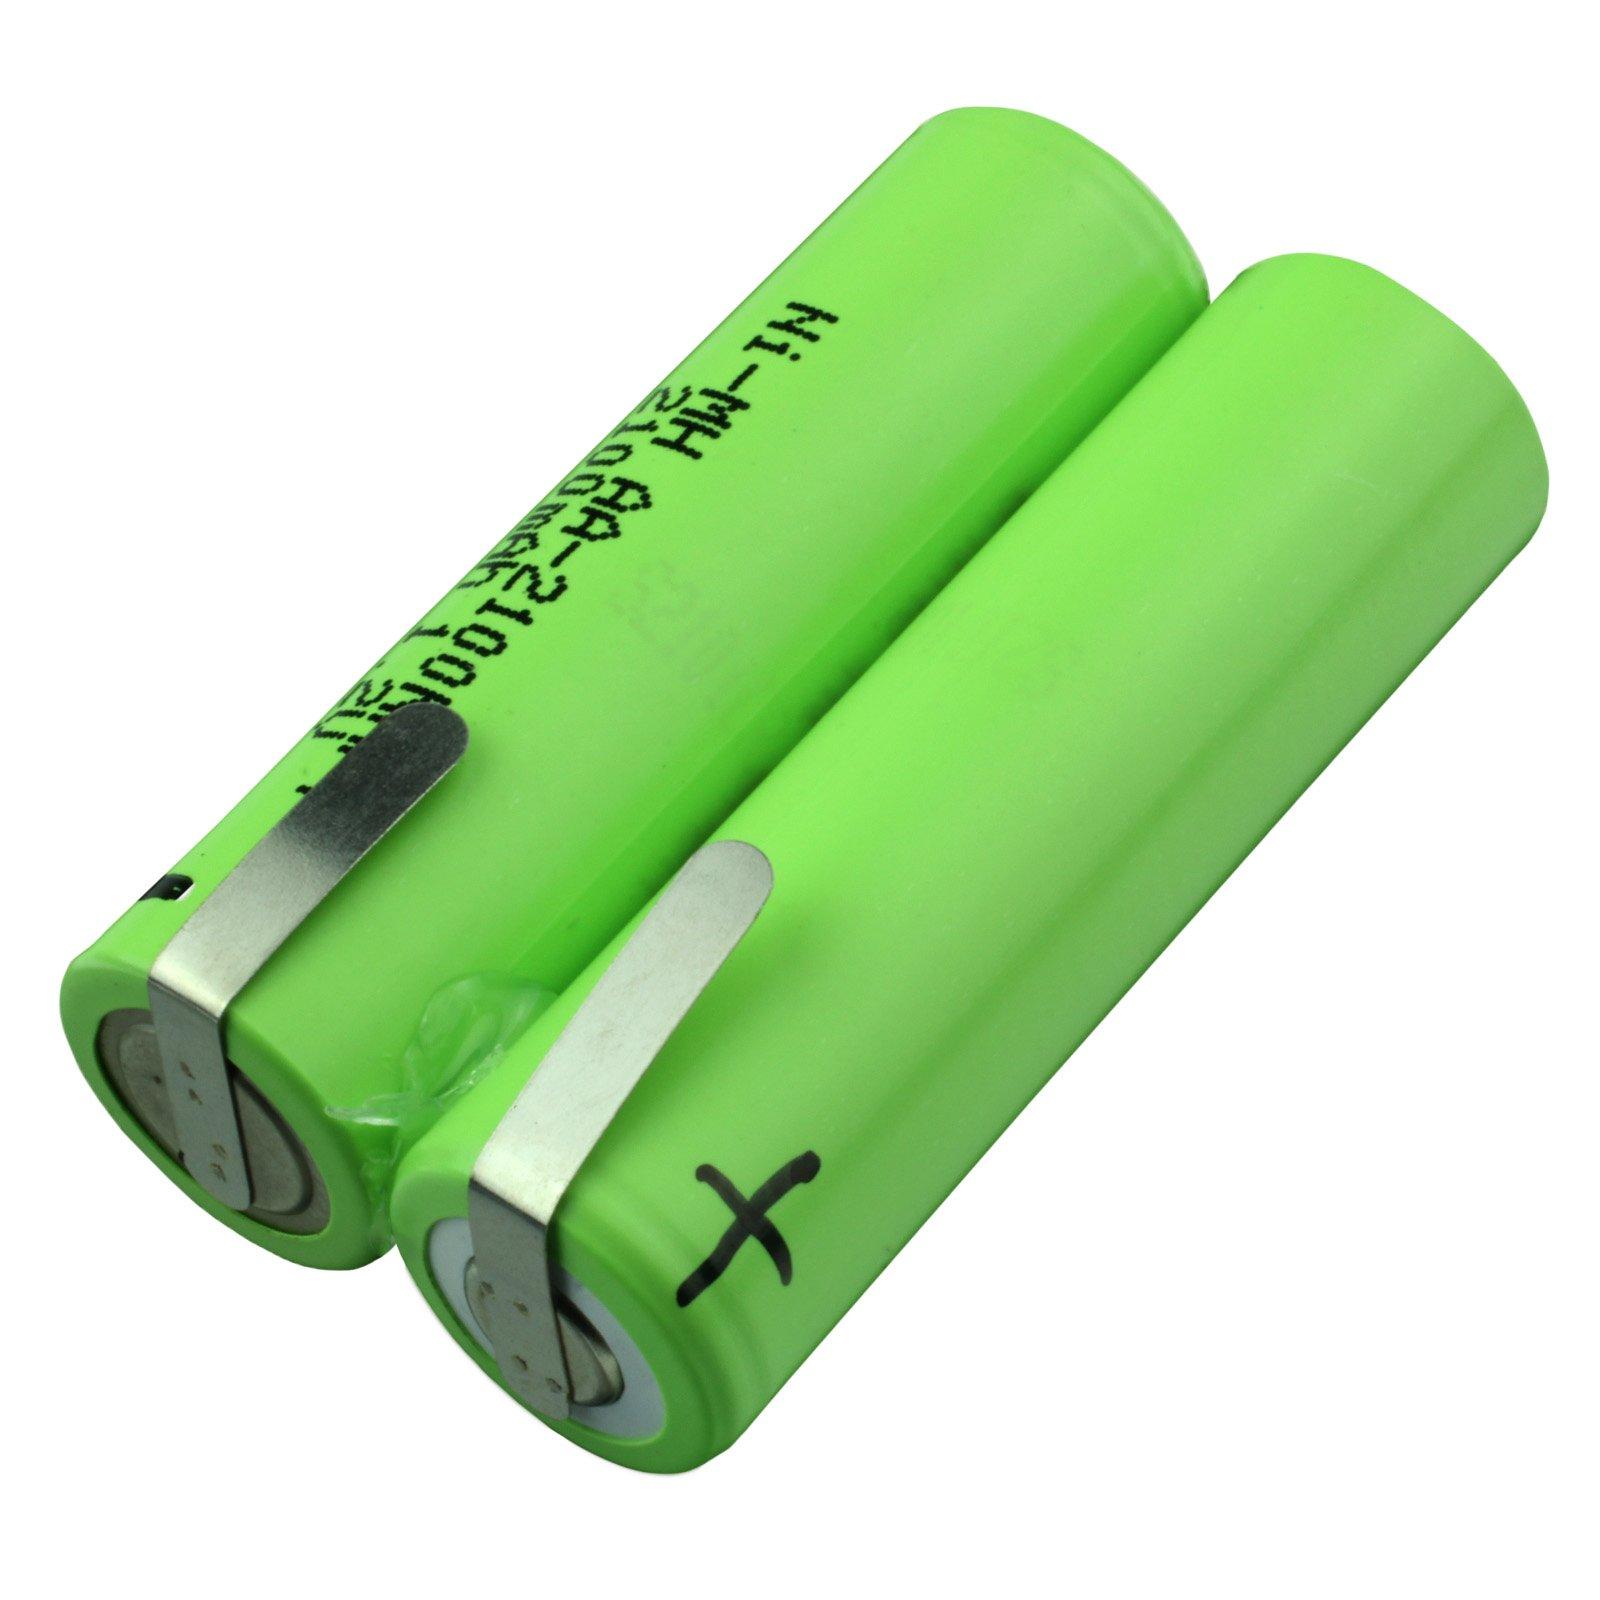 2 4 Volt 1100 Mah Nimh Cordless Razor Battery Batterymart Com